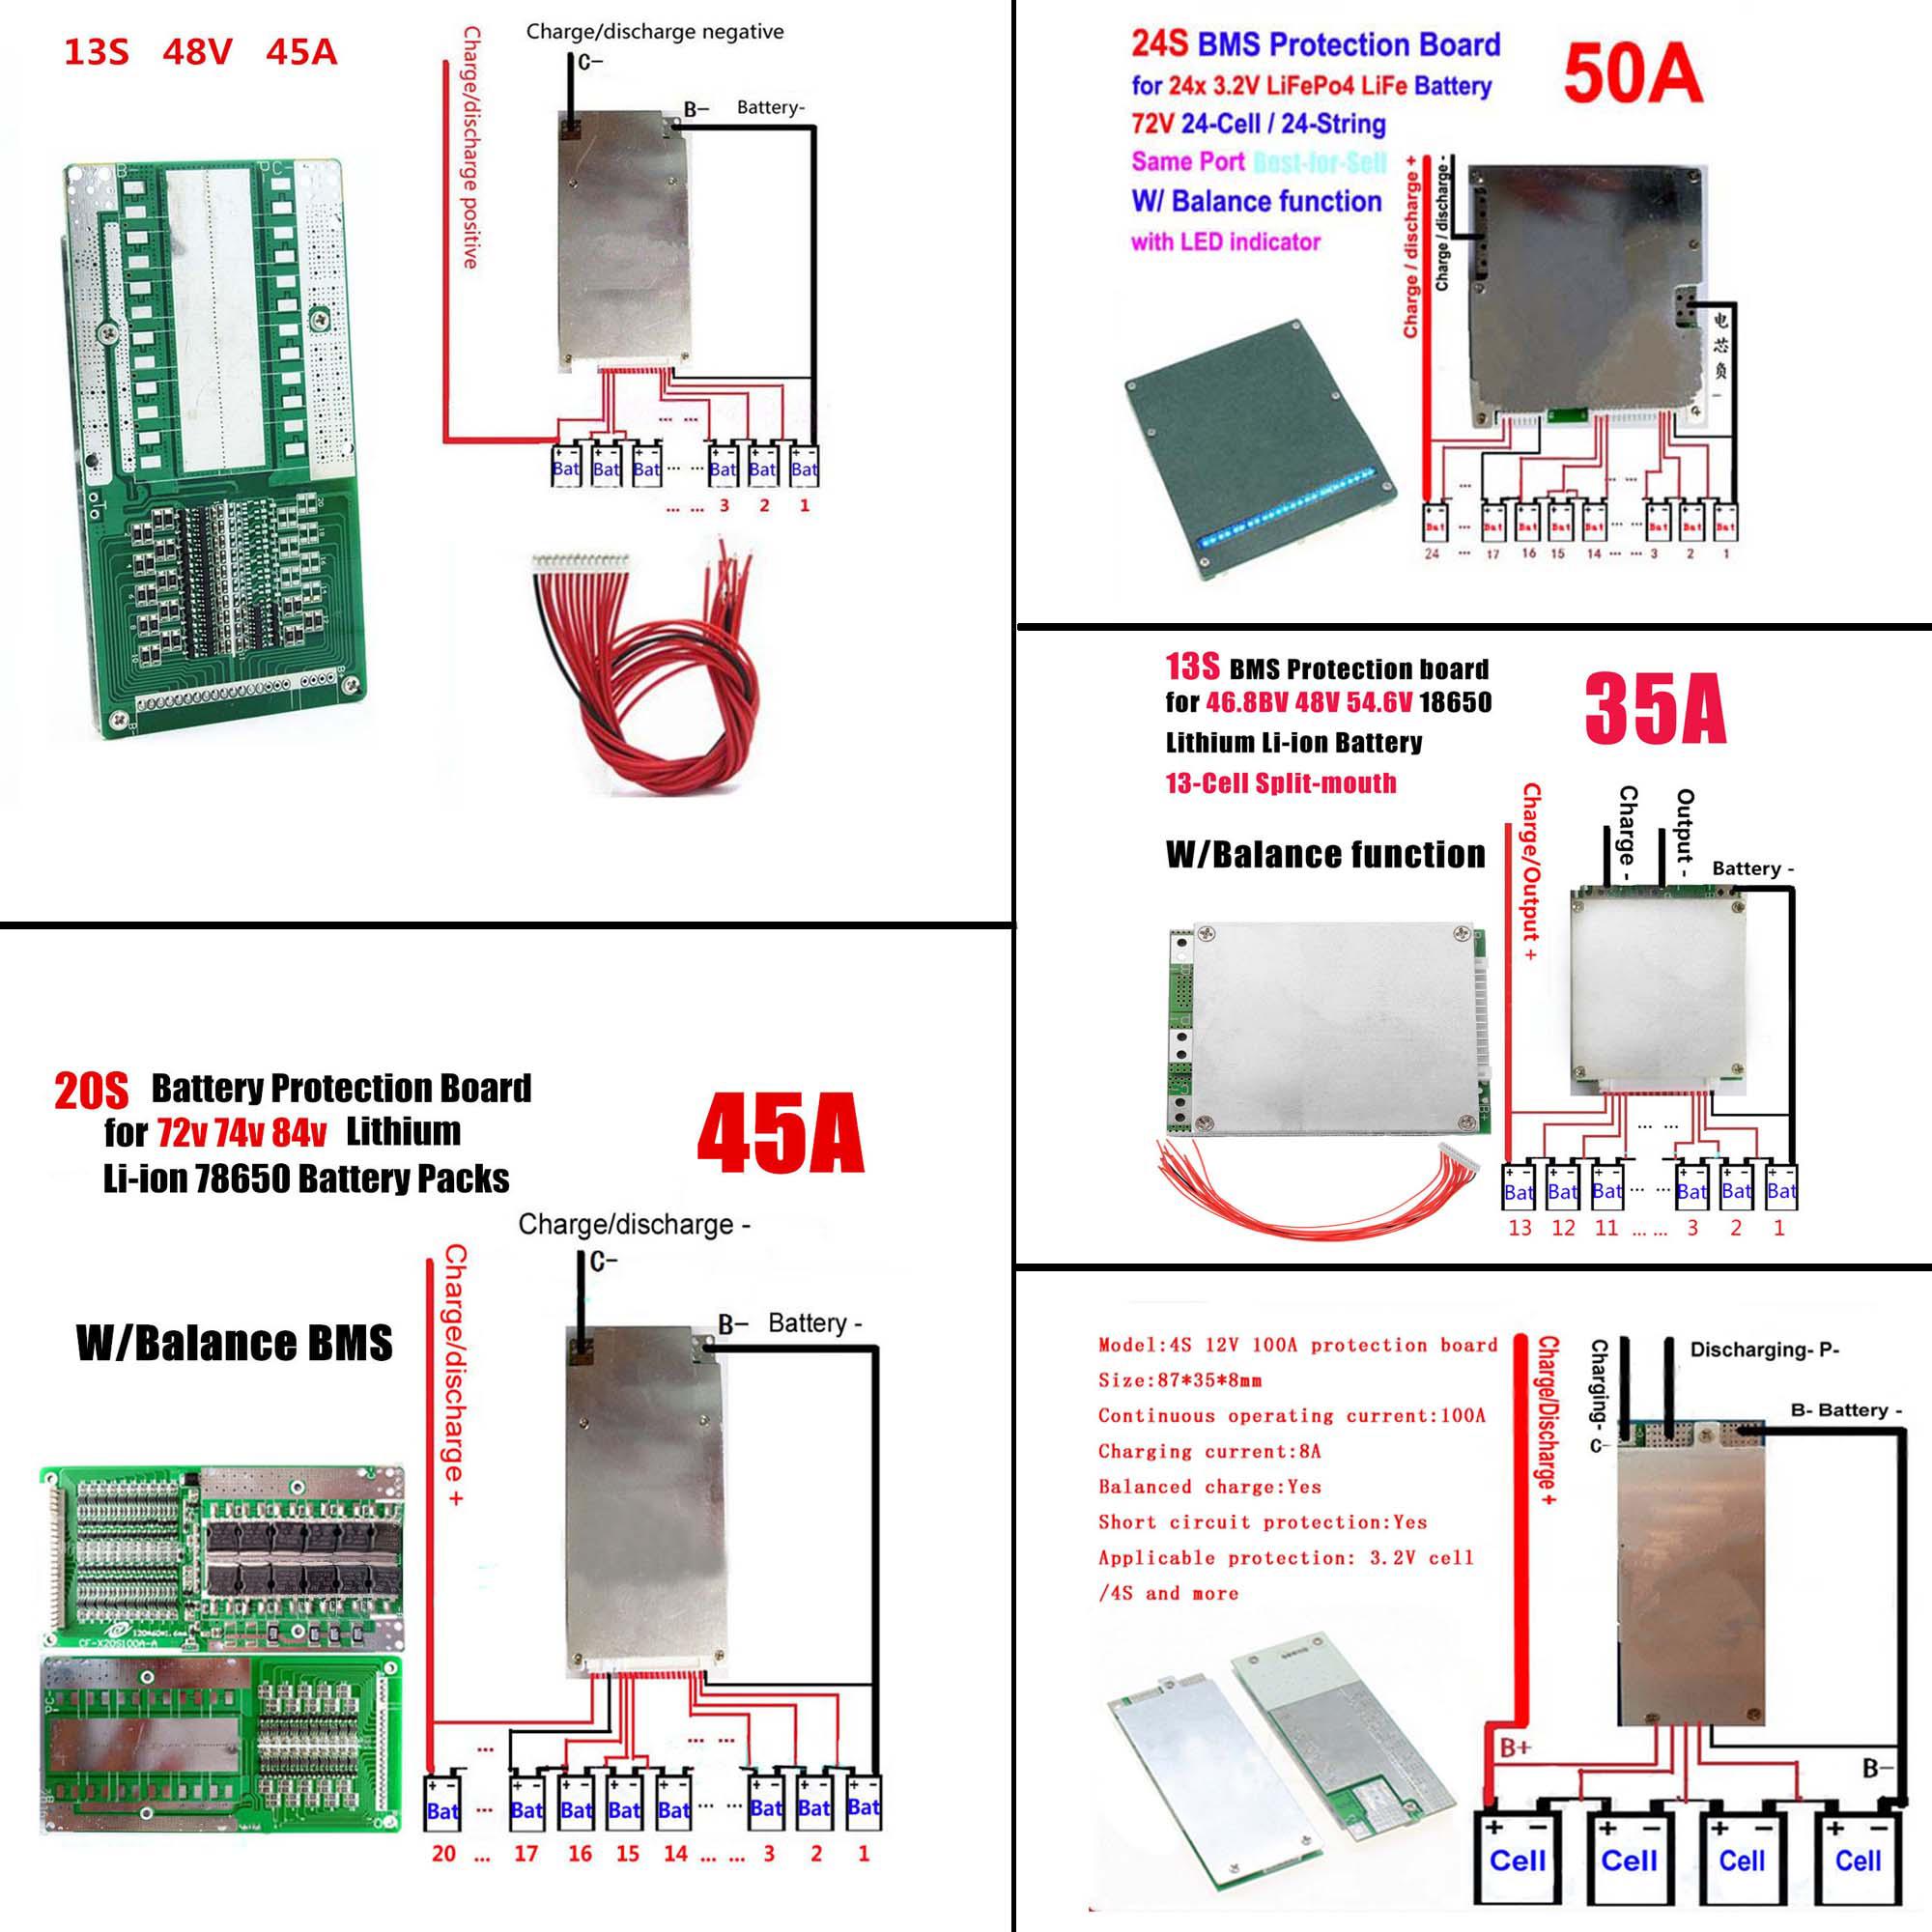 Kreidemarker Kreidestift Flüssigkreide Marker WhiteboardmarkerRot 12 Stk